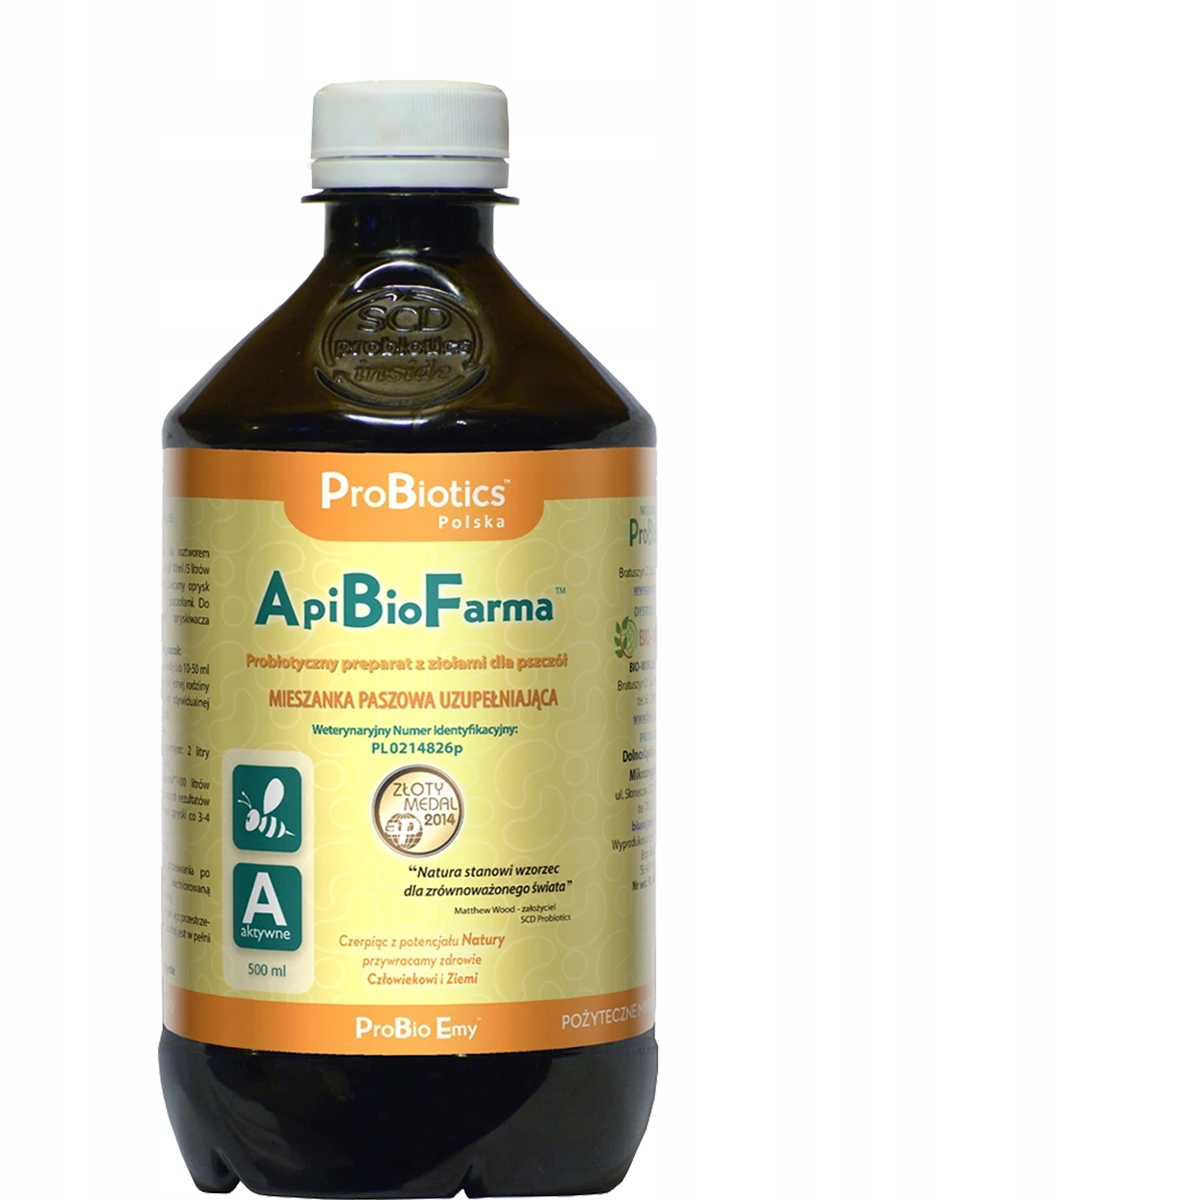 SUPER Probiotyk WZMACNIA pszczoły ApiBioFarma 0,5L